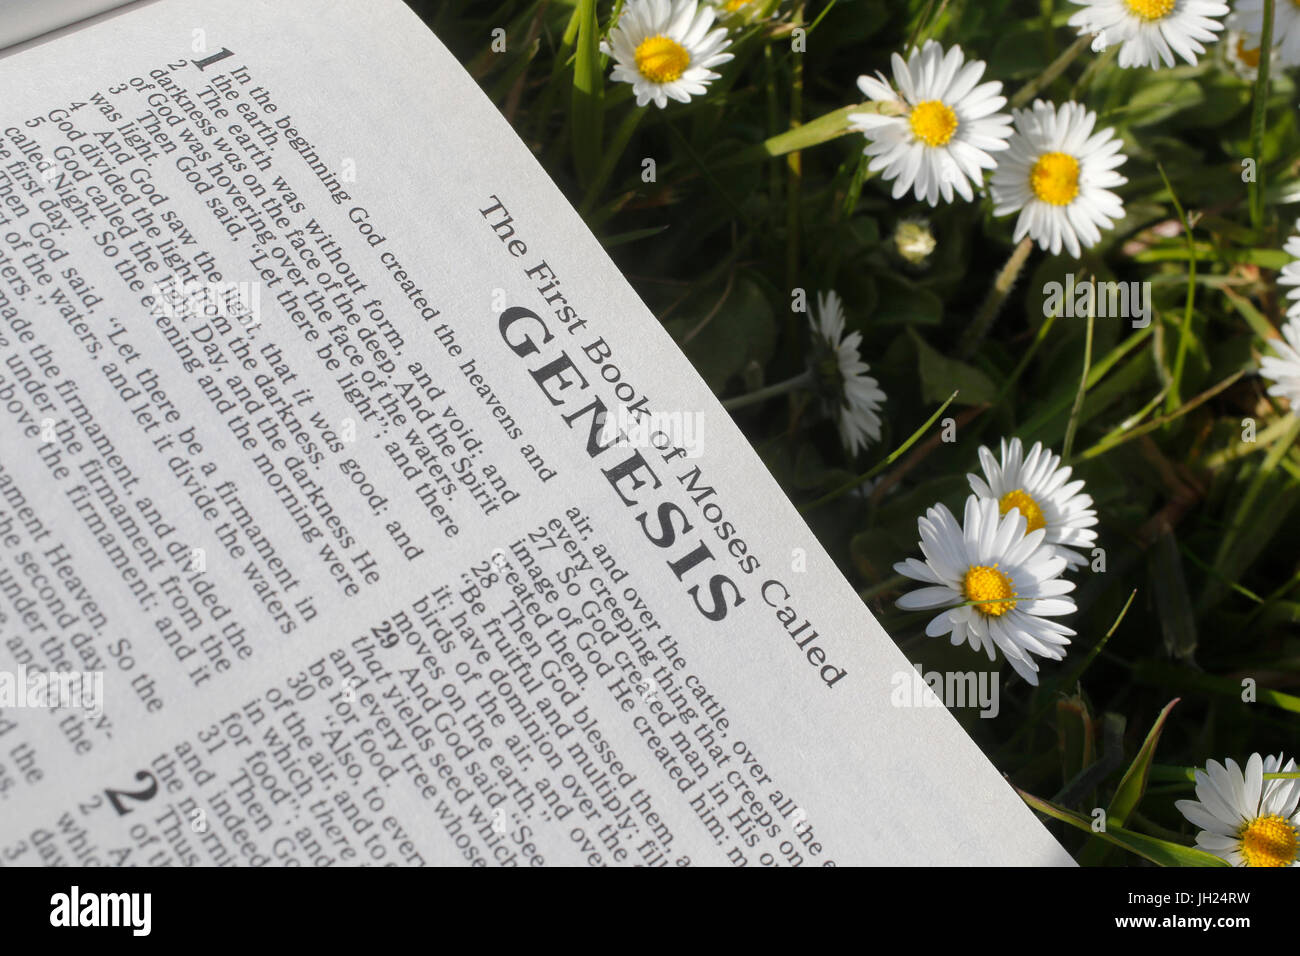 Aufgeschlagene Bibel. Genese. Stockbild